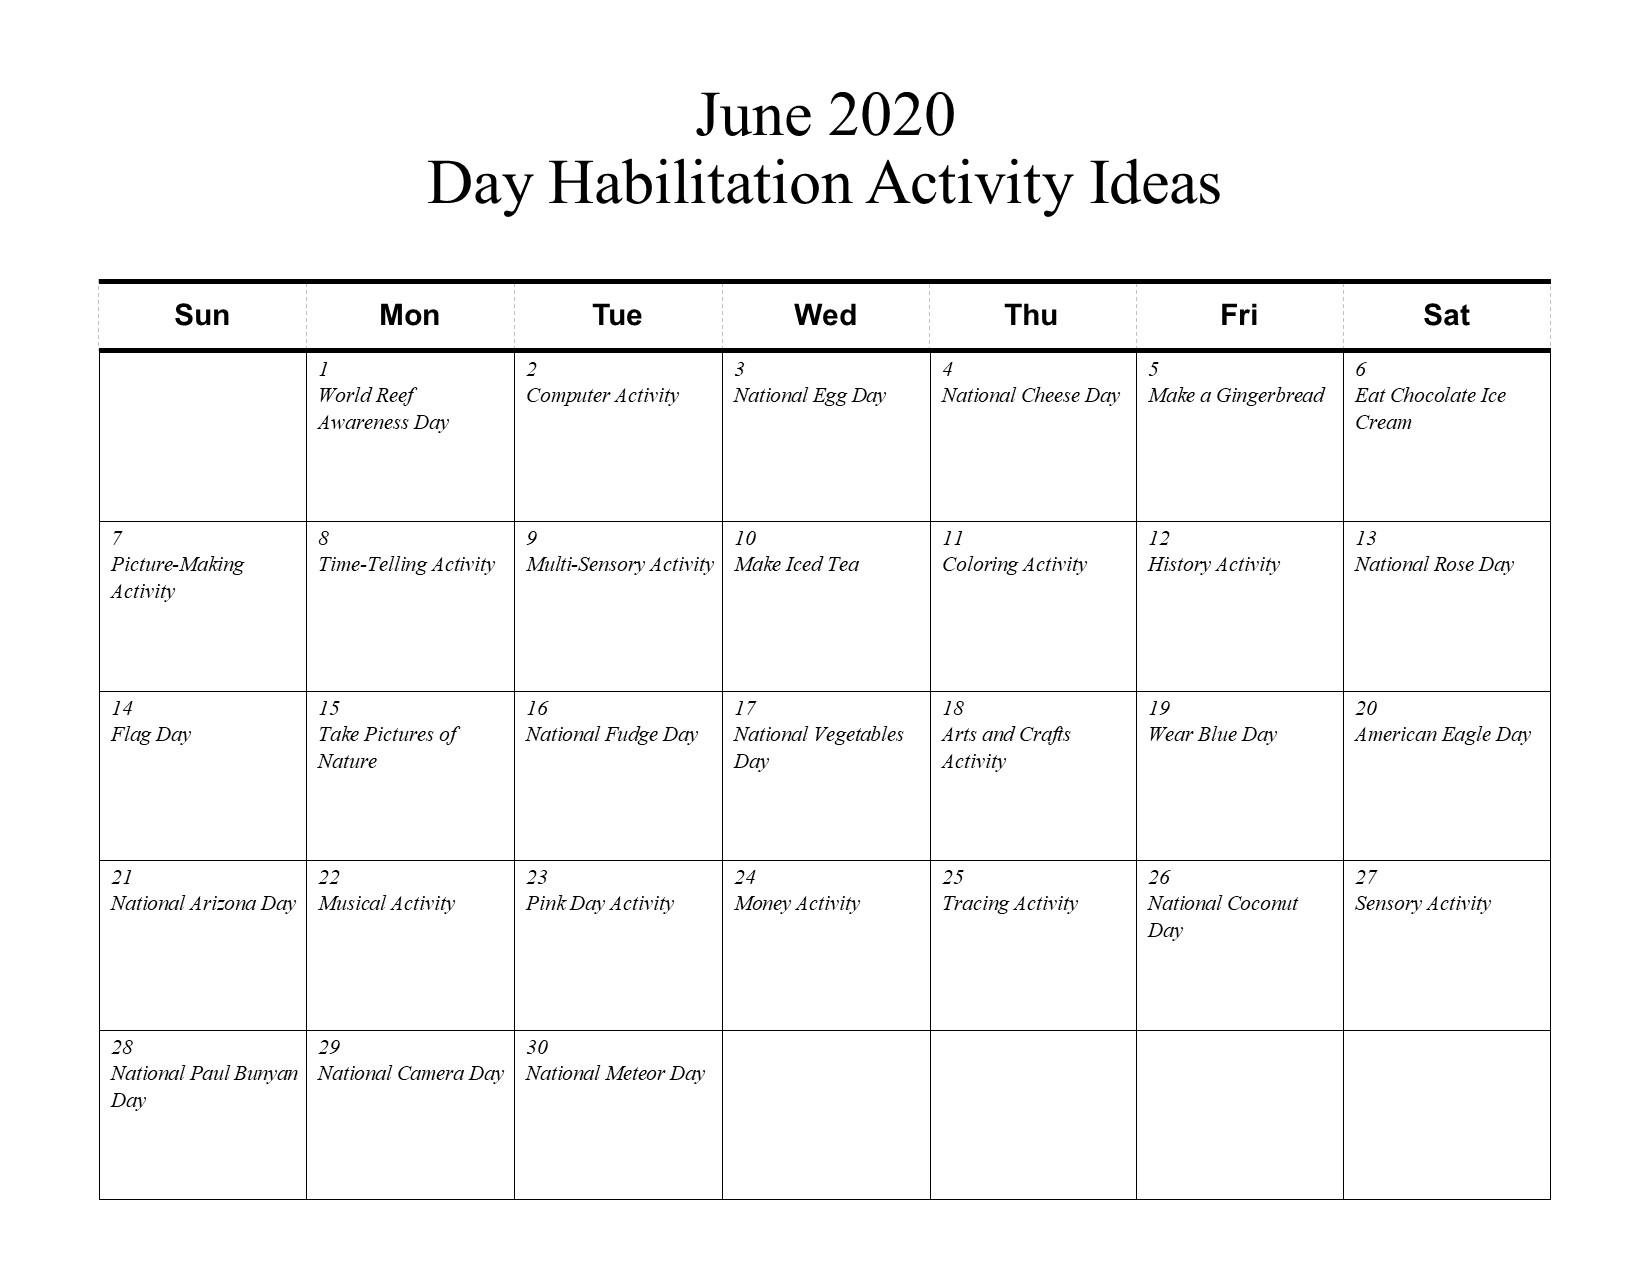 June Day Habilitation Activity Ideas